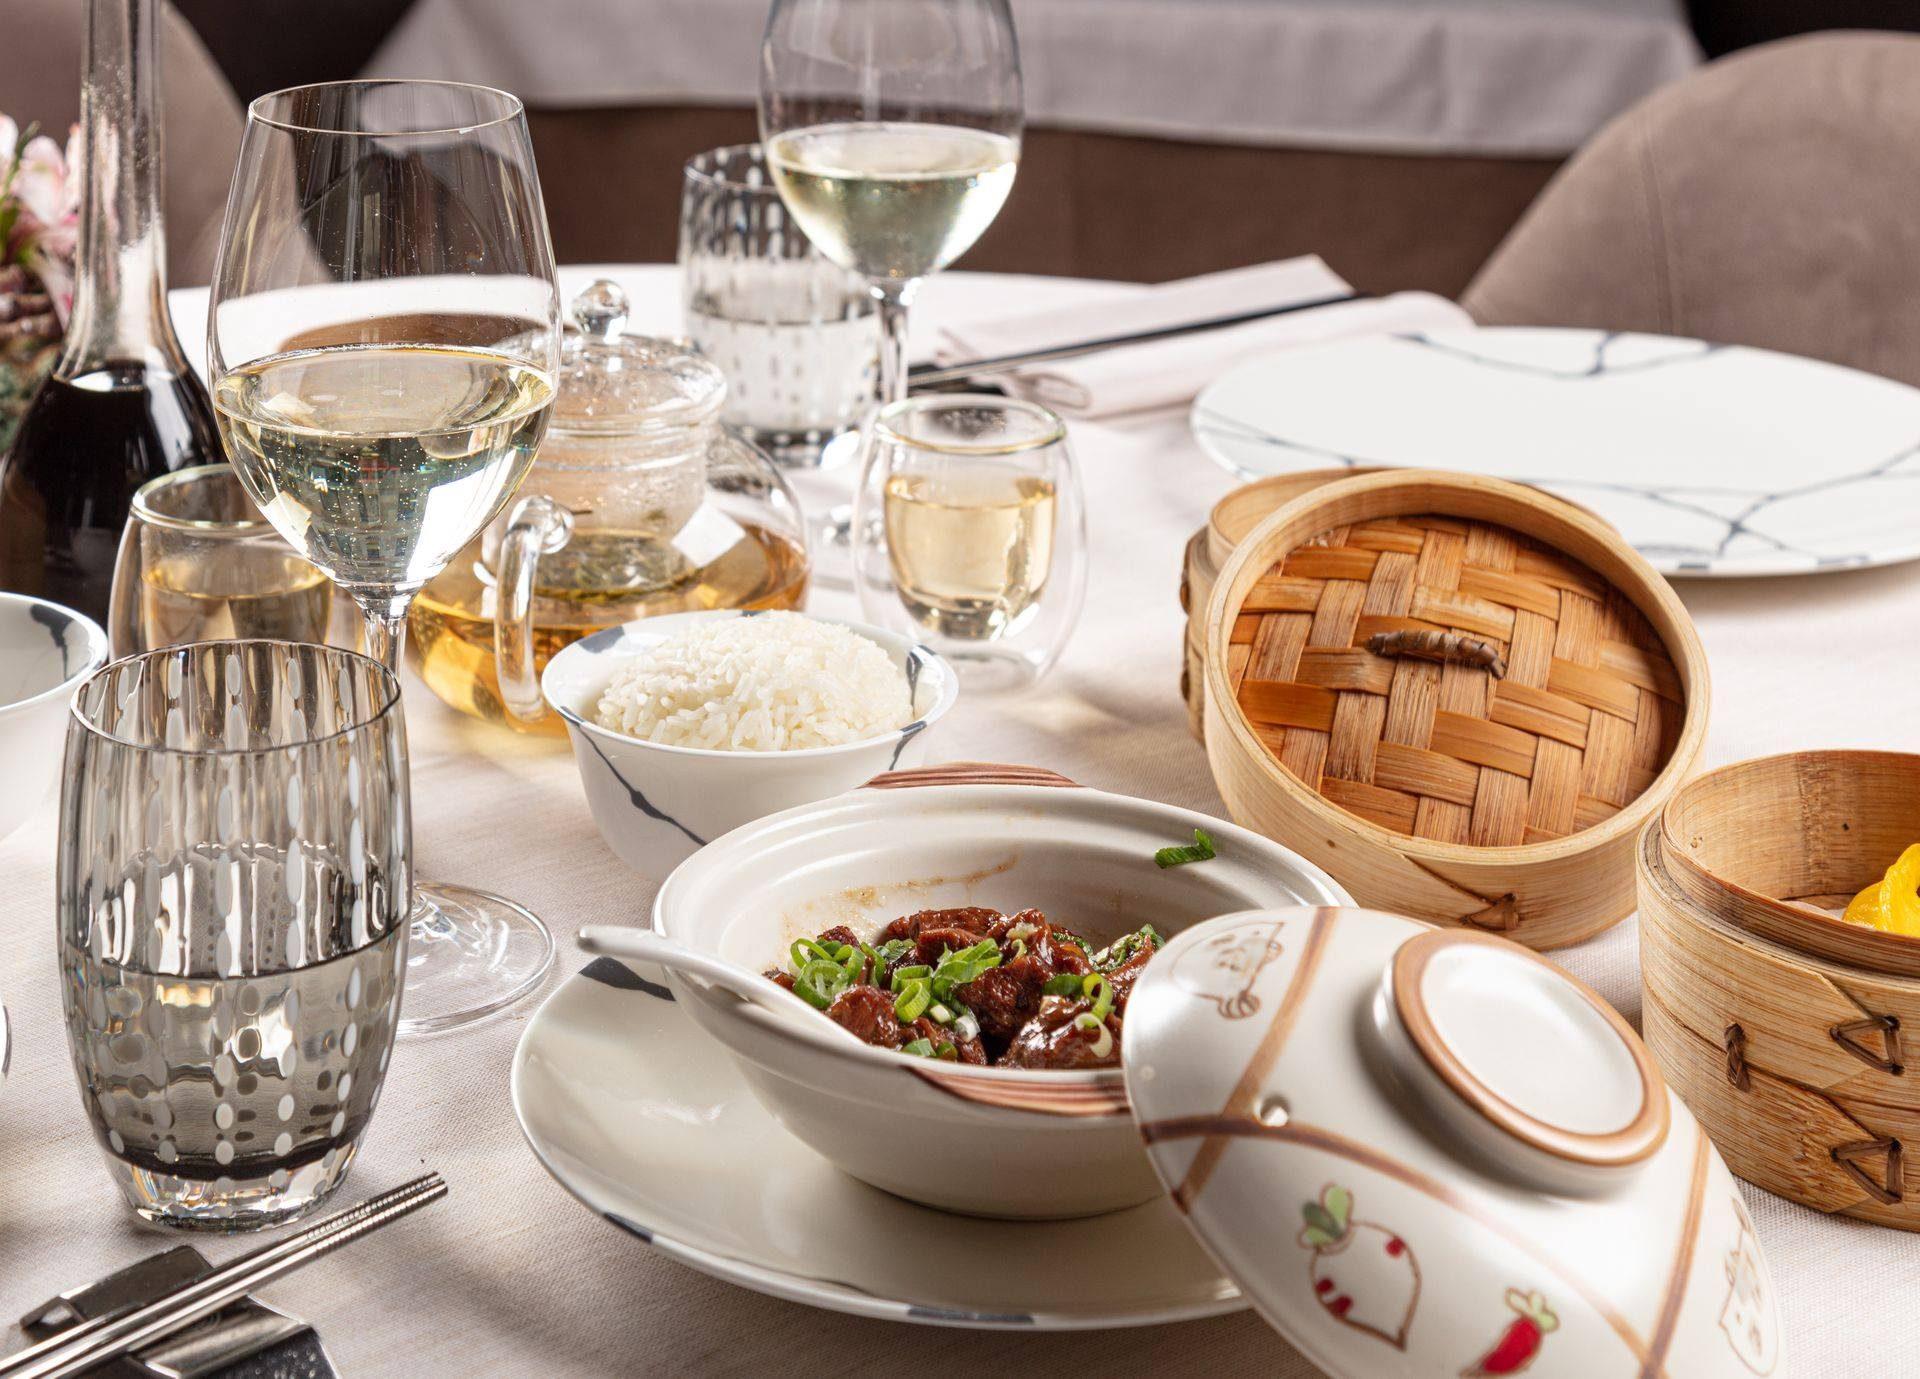 Migliori ristoranti cinesi in italia: Dim Sum, Milano